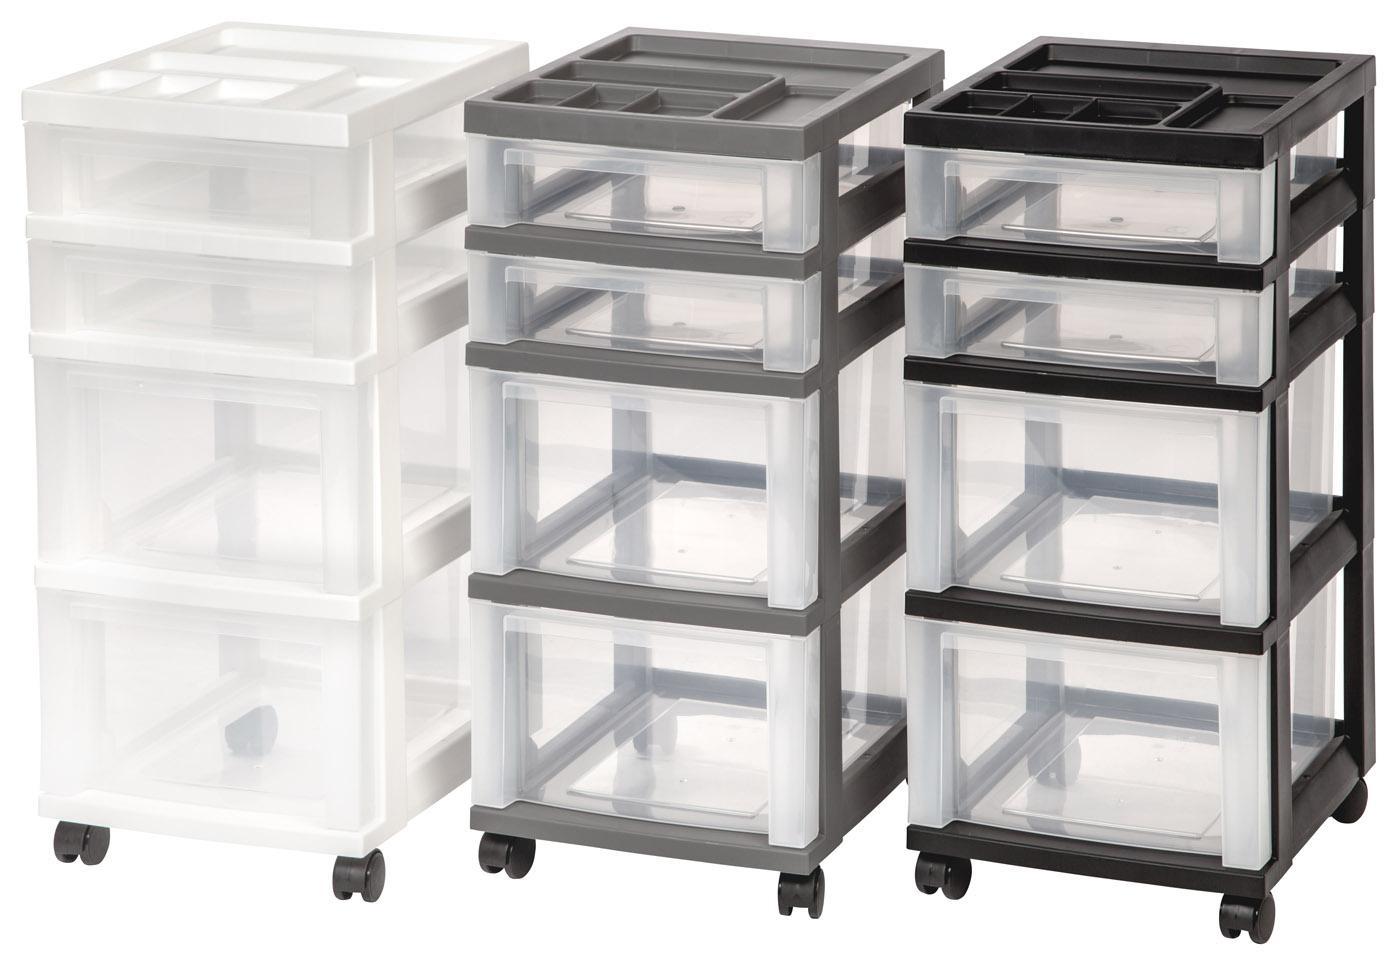 iris 4 drawer rolling storage cart with organizer top gray home kitchen. Black Bedroom Furniture Sets. Home Design Ideas